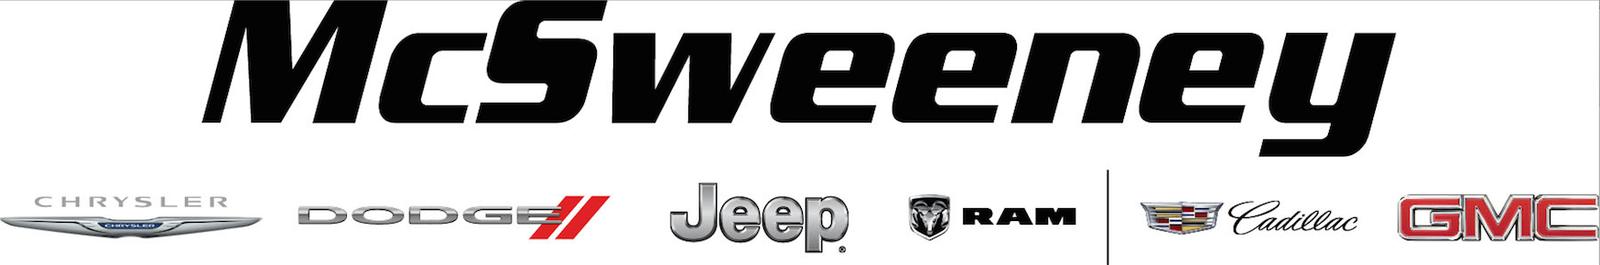 Mcsweeney Automotive Group Llc Talladega Al Read